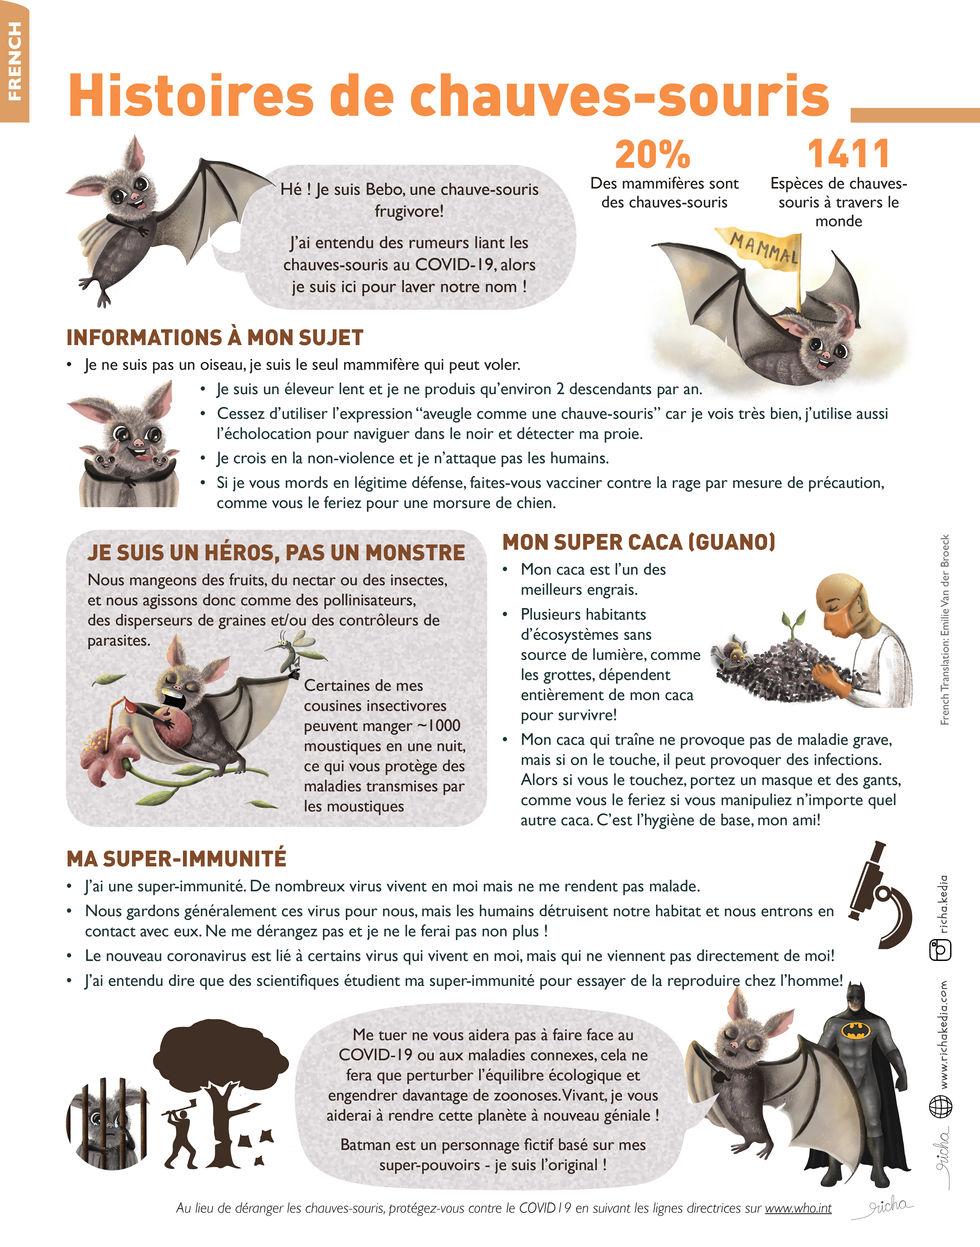 Bat Infographic french.jpg